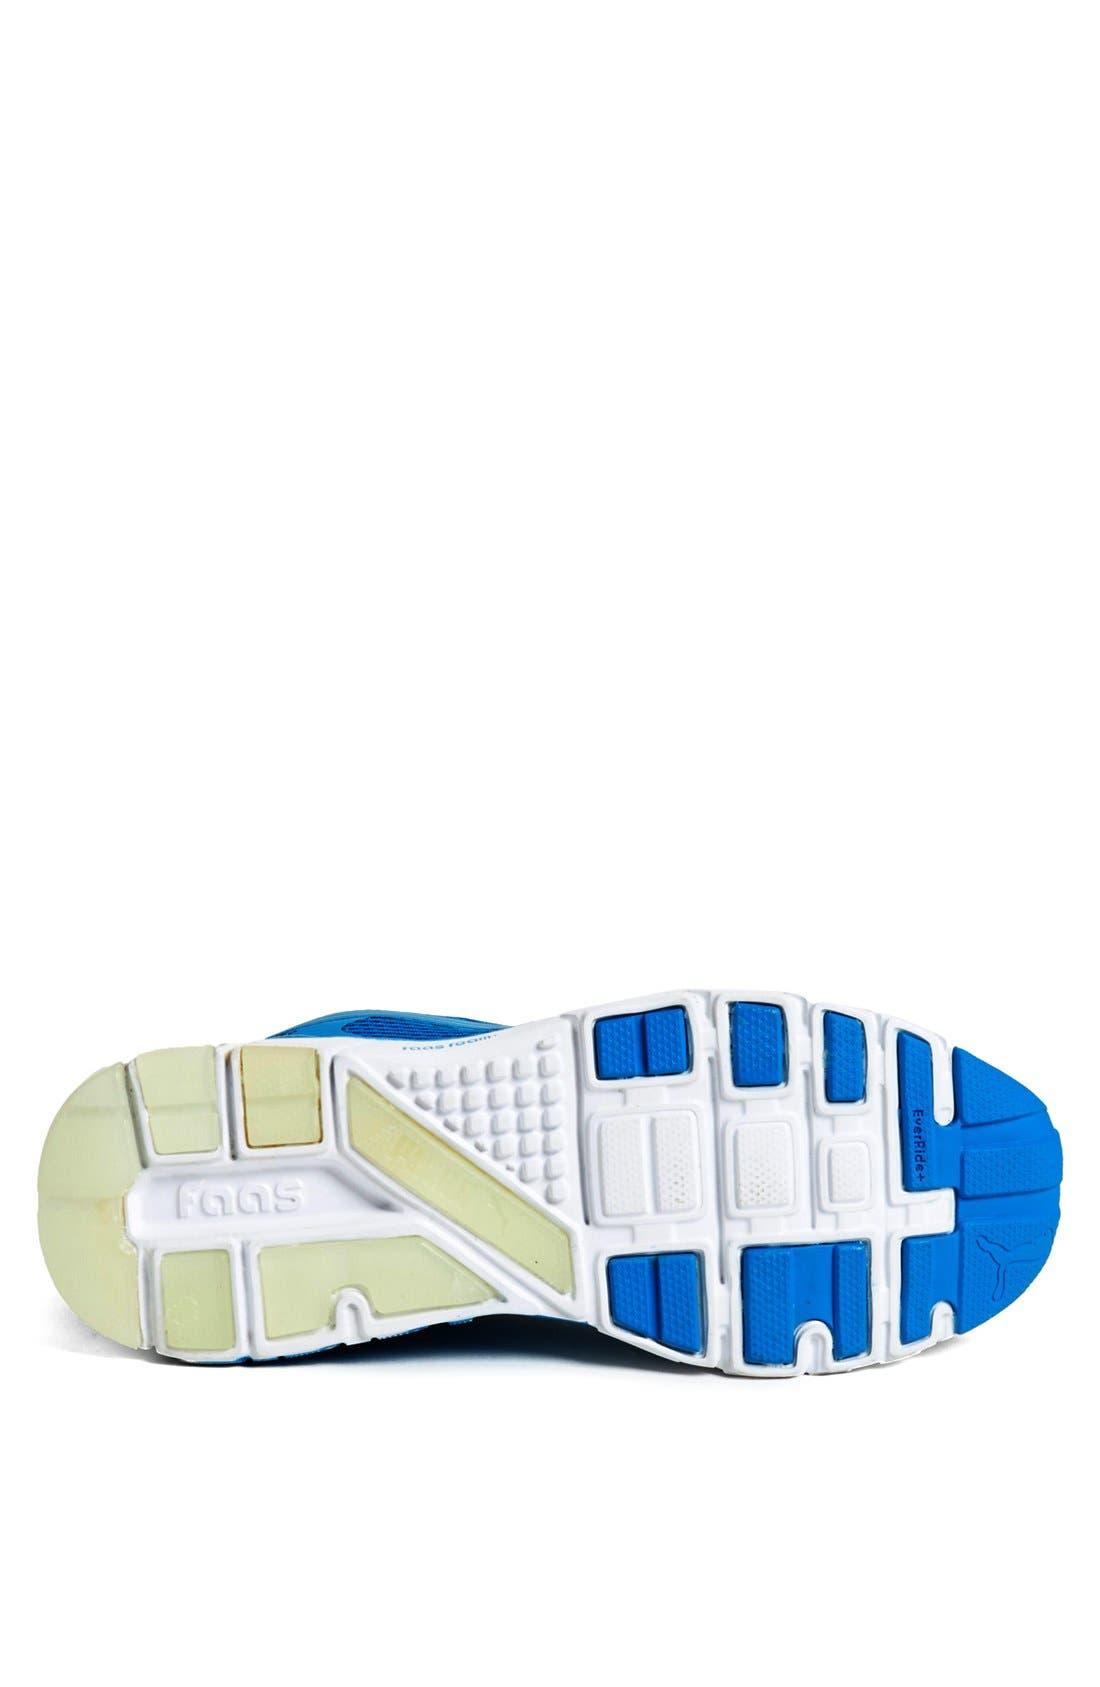 Alternate Image 4  - PUMA 'Faas 600 S Glow' Running Shoe (Men)